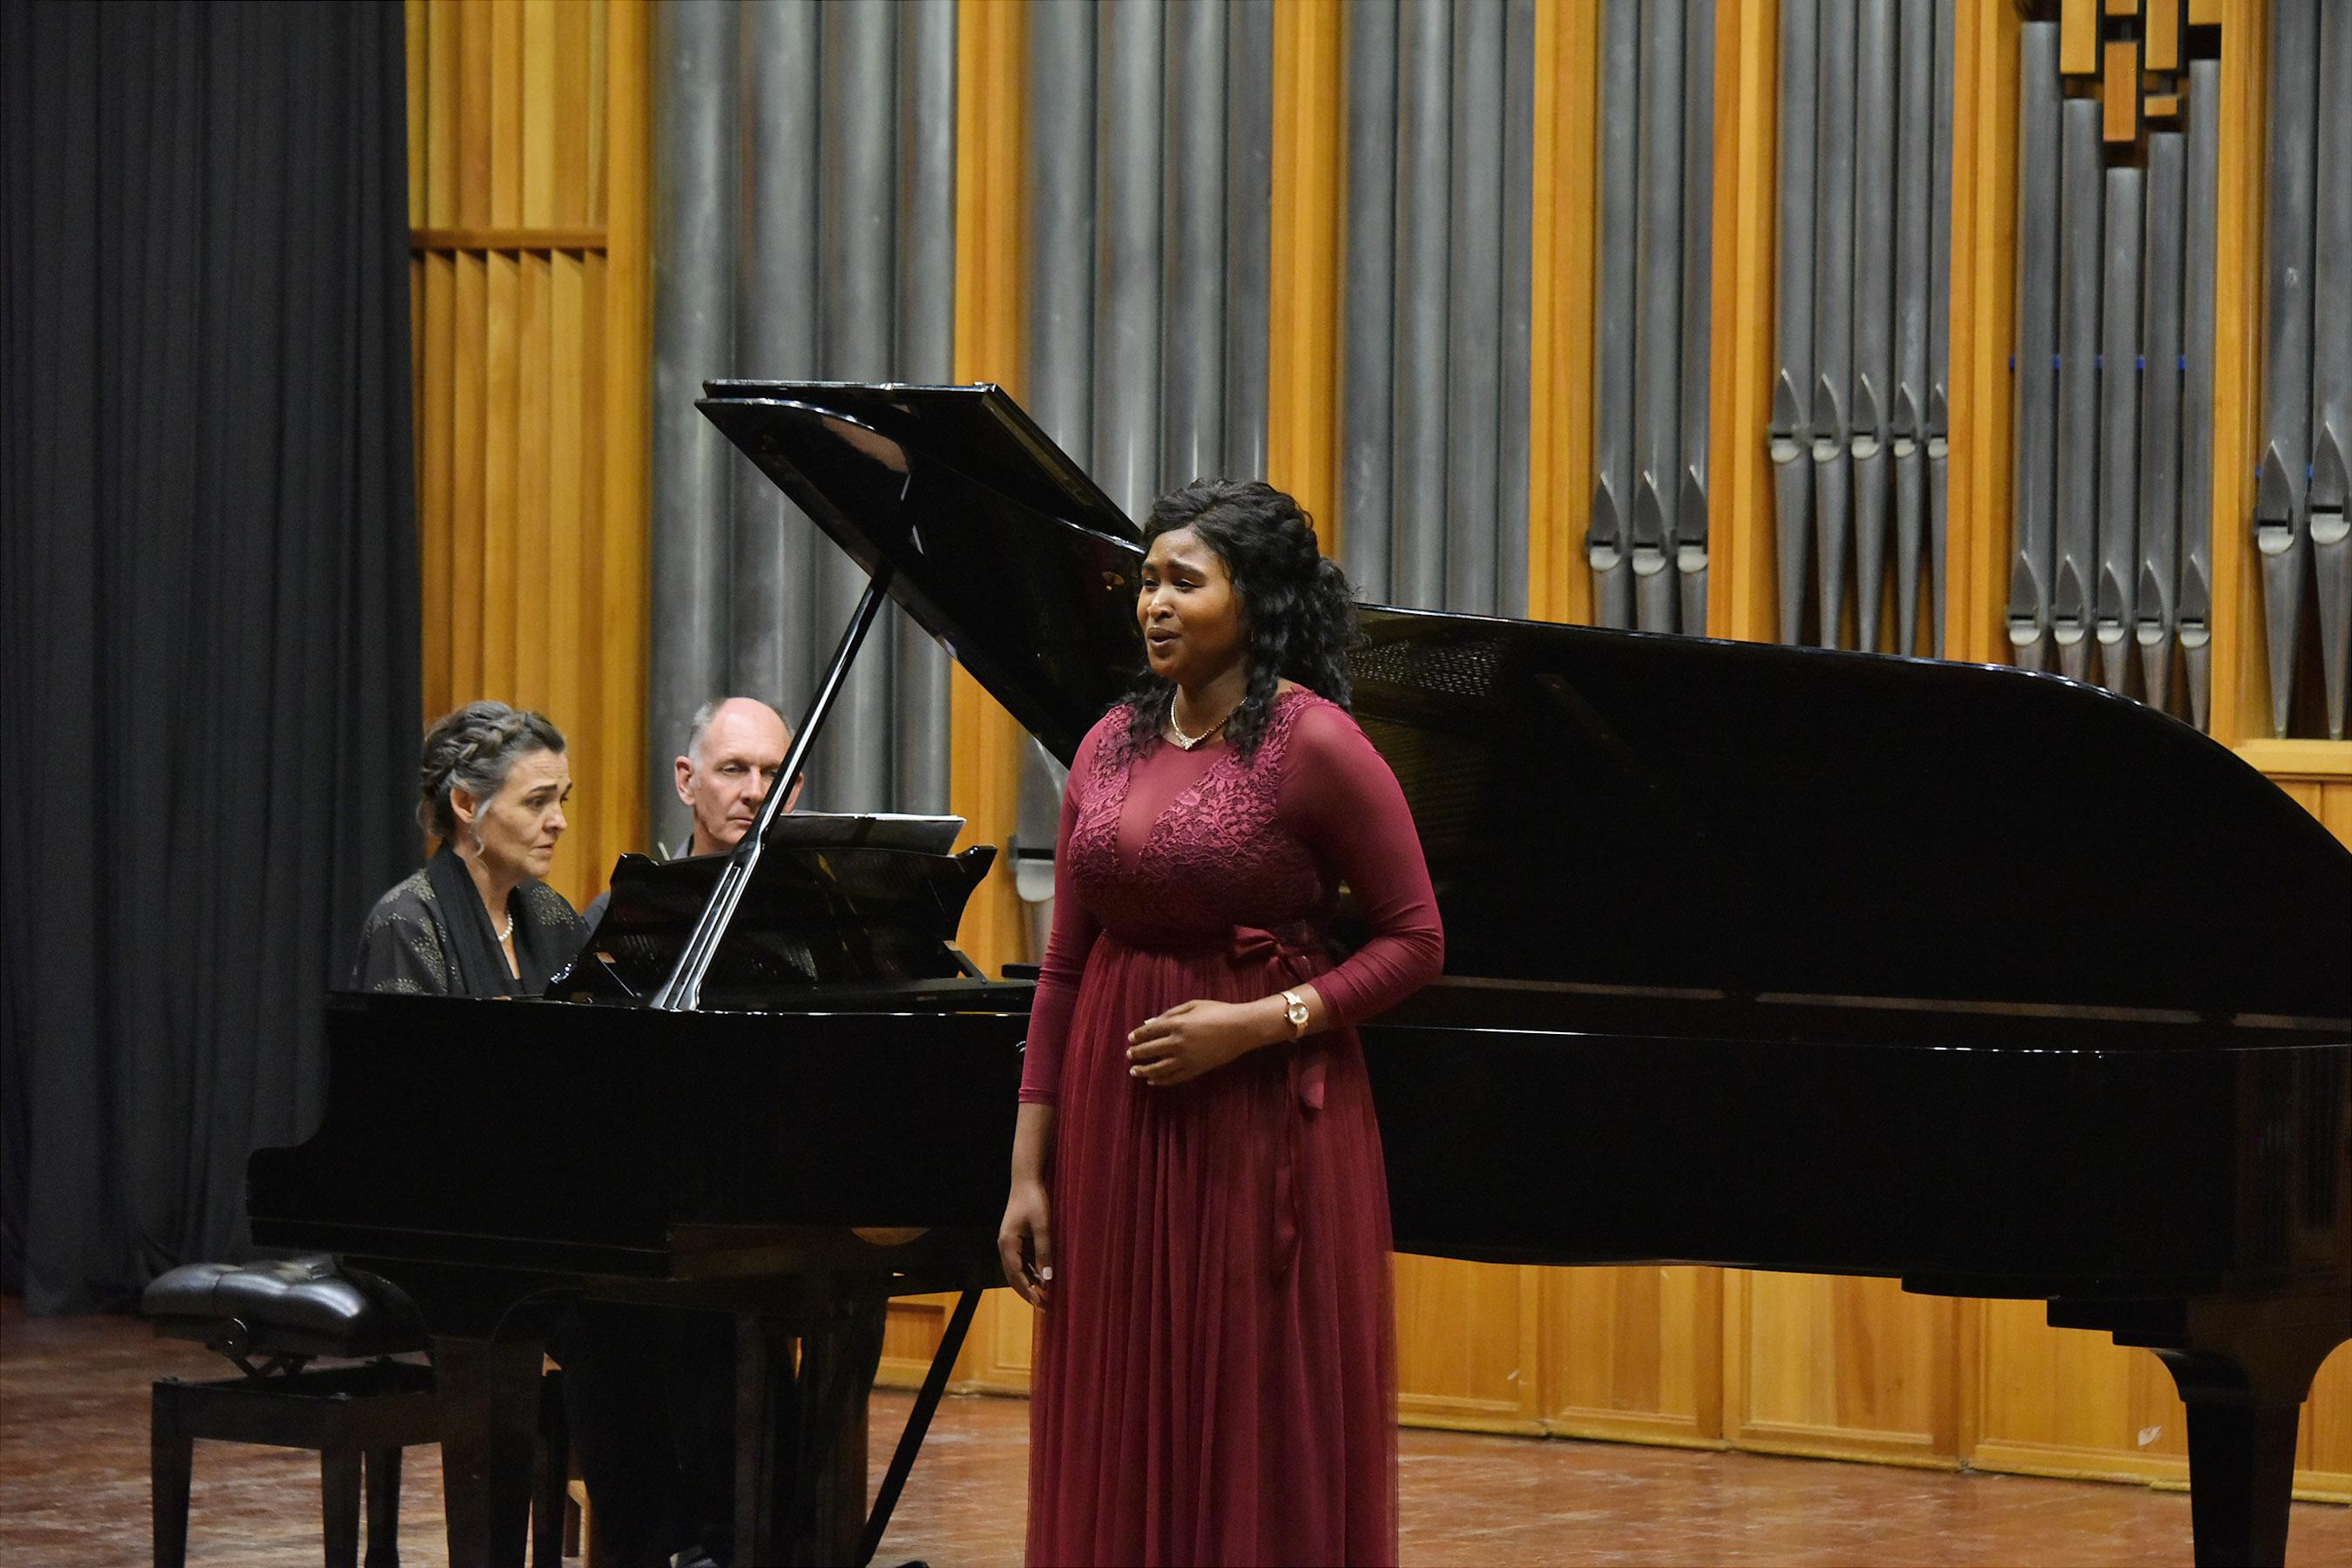 Charity Leburu (soprano) and Anneke Lamont